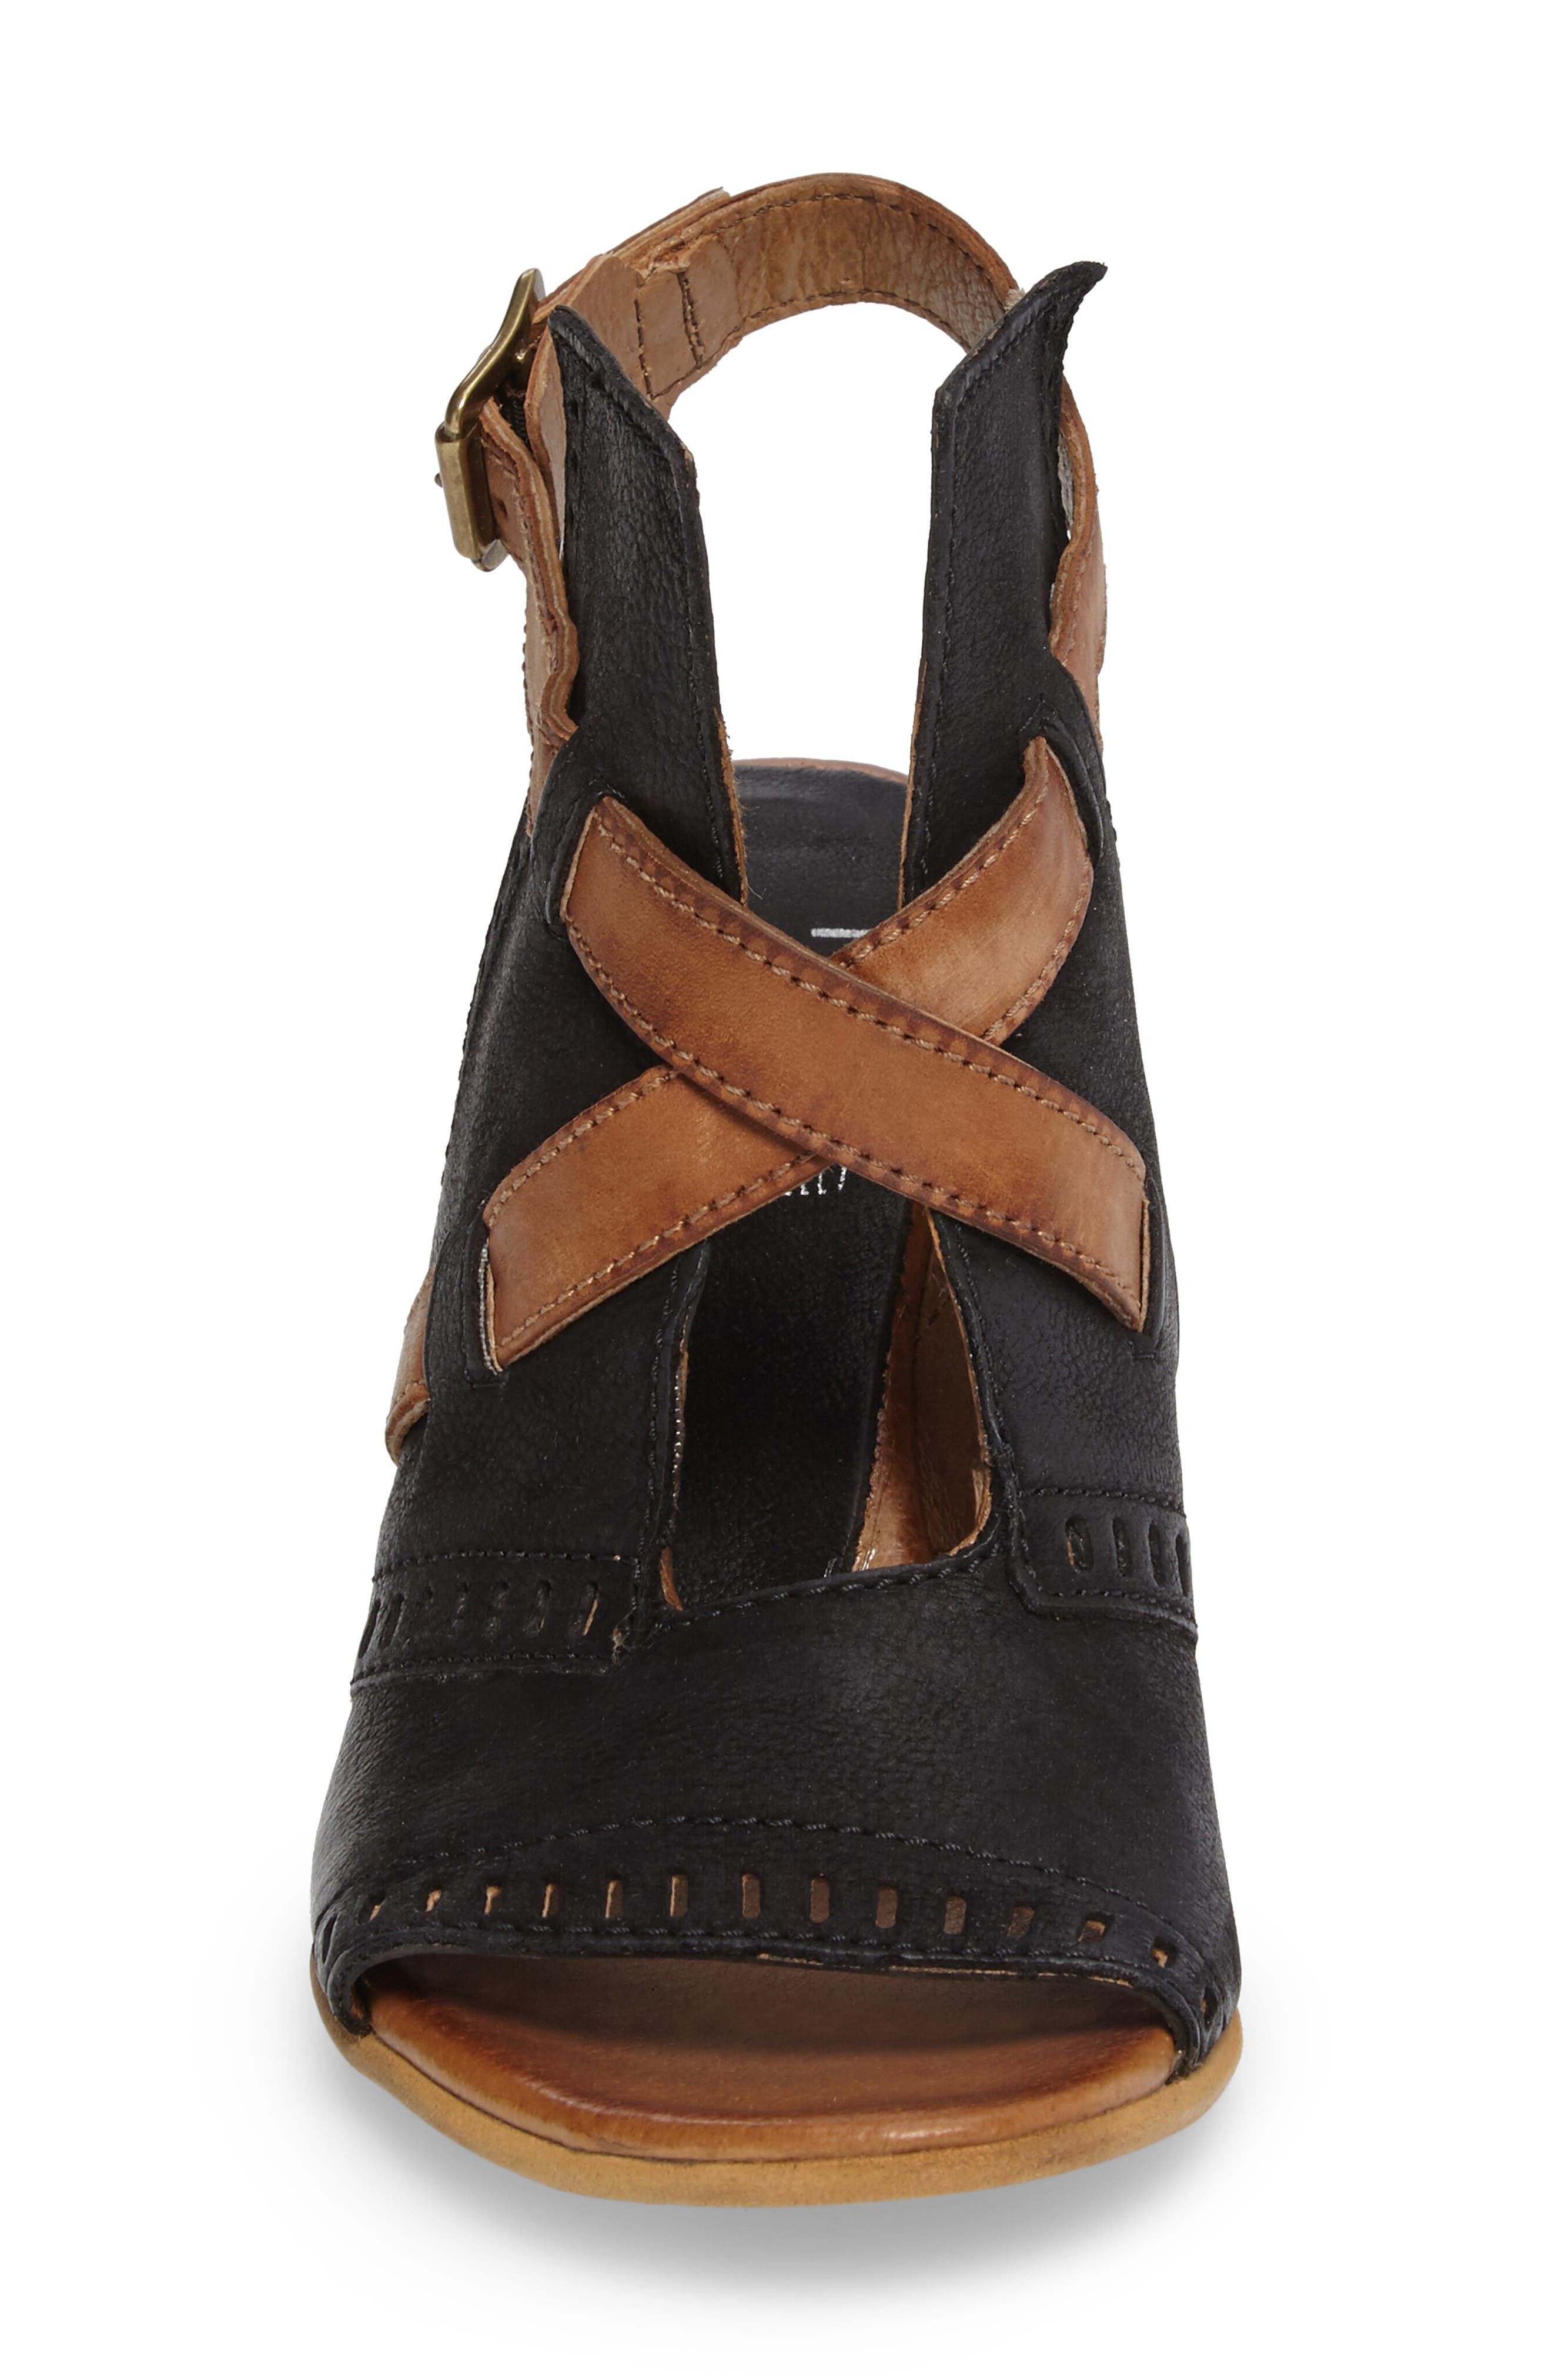 Kipling Perforated Sandal,                             Alternate thumbnail 13, color,